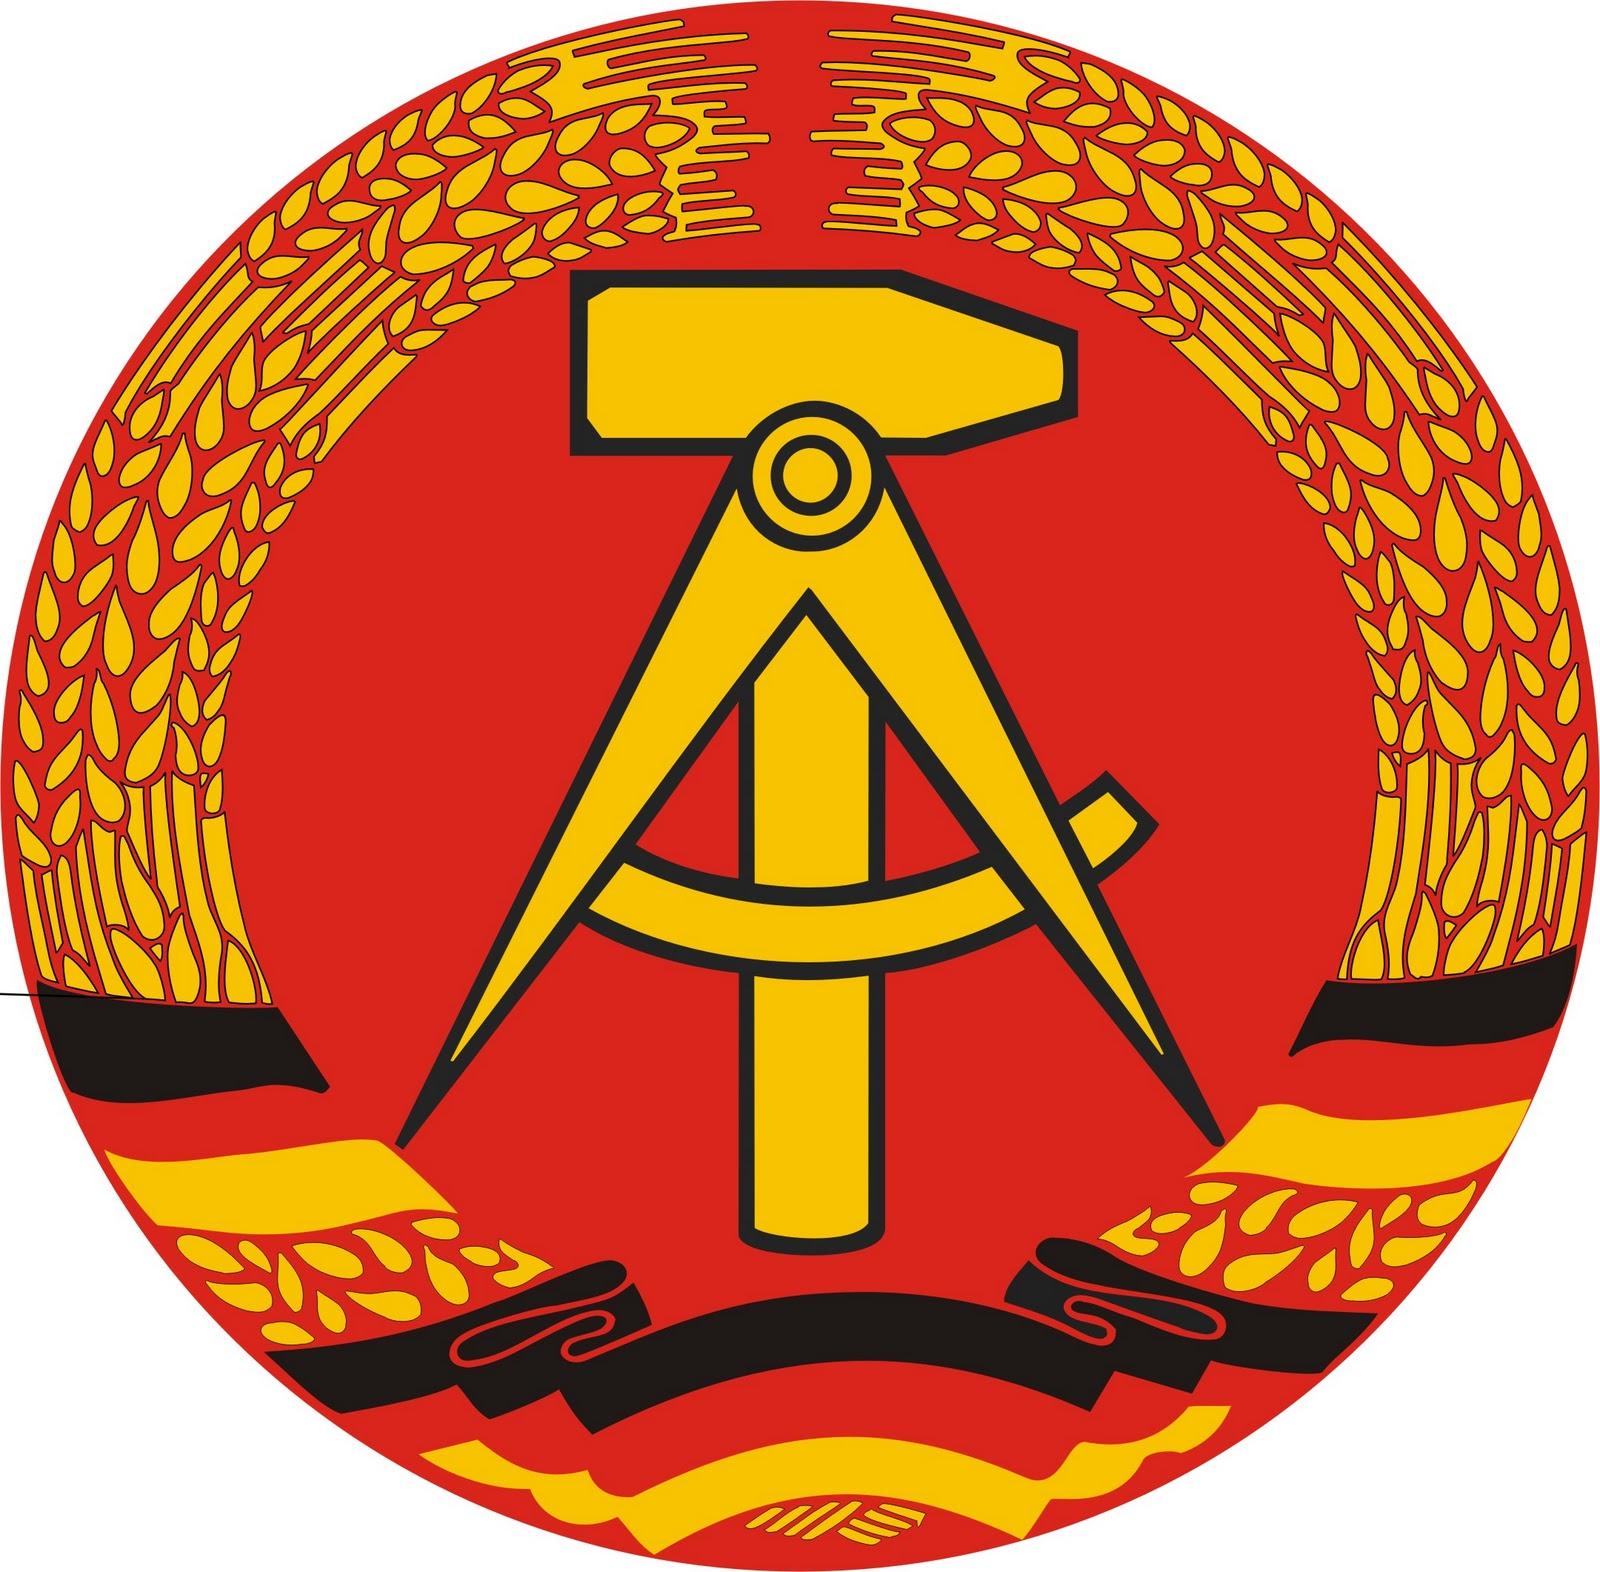 Ddr Symbole